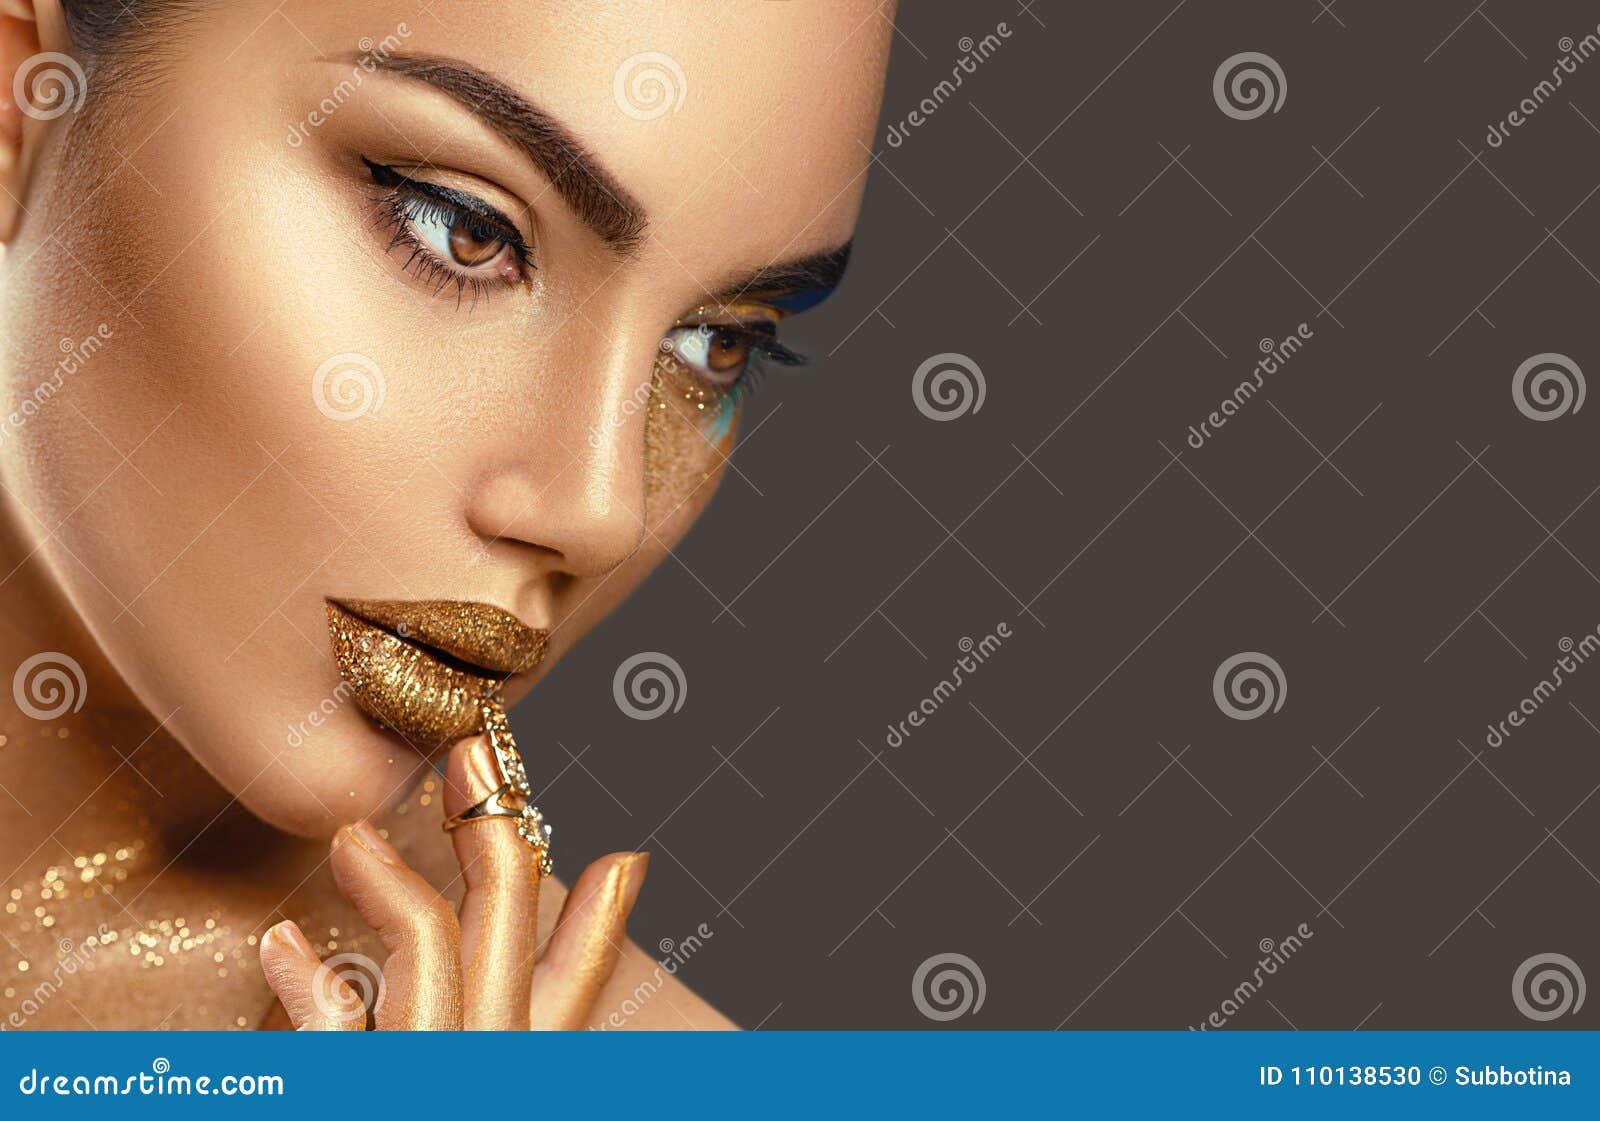 Fashion art makeup. Portrait of beauty woman with golden skin. Shiny professional makeup